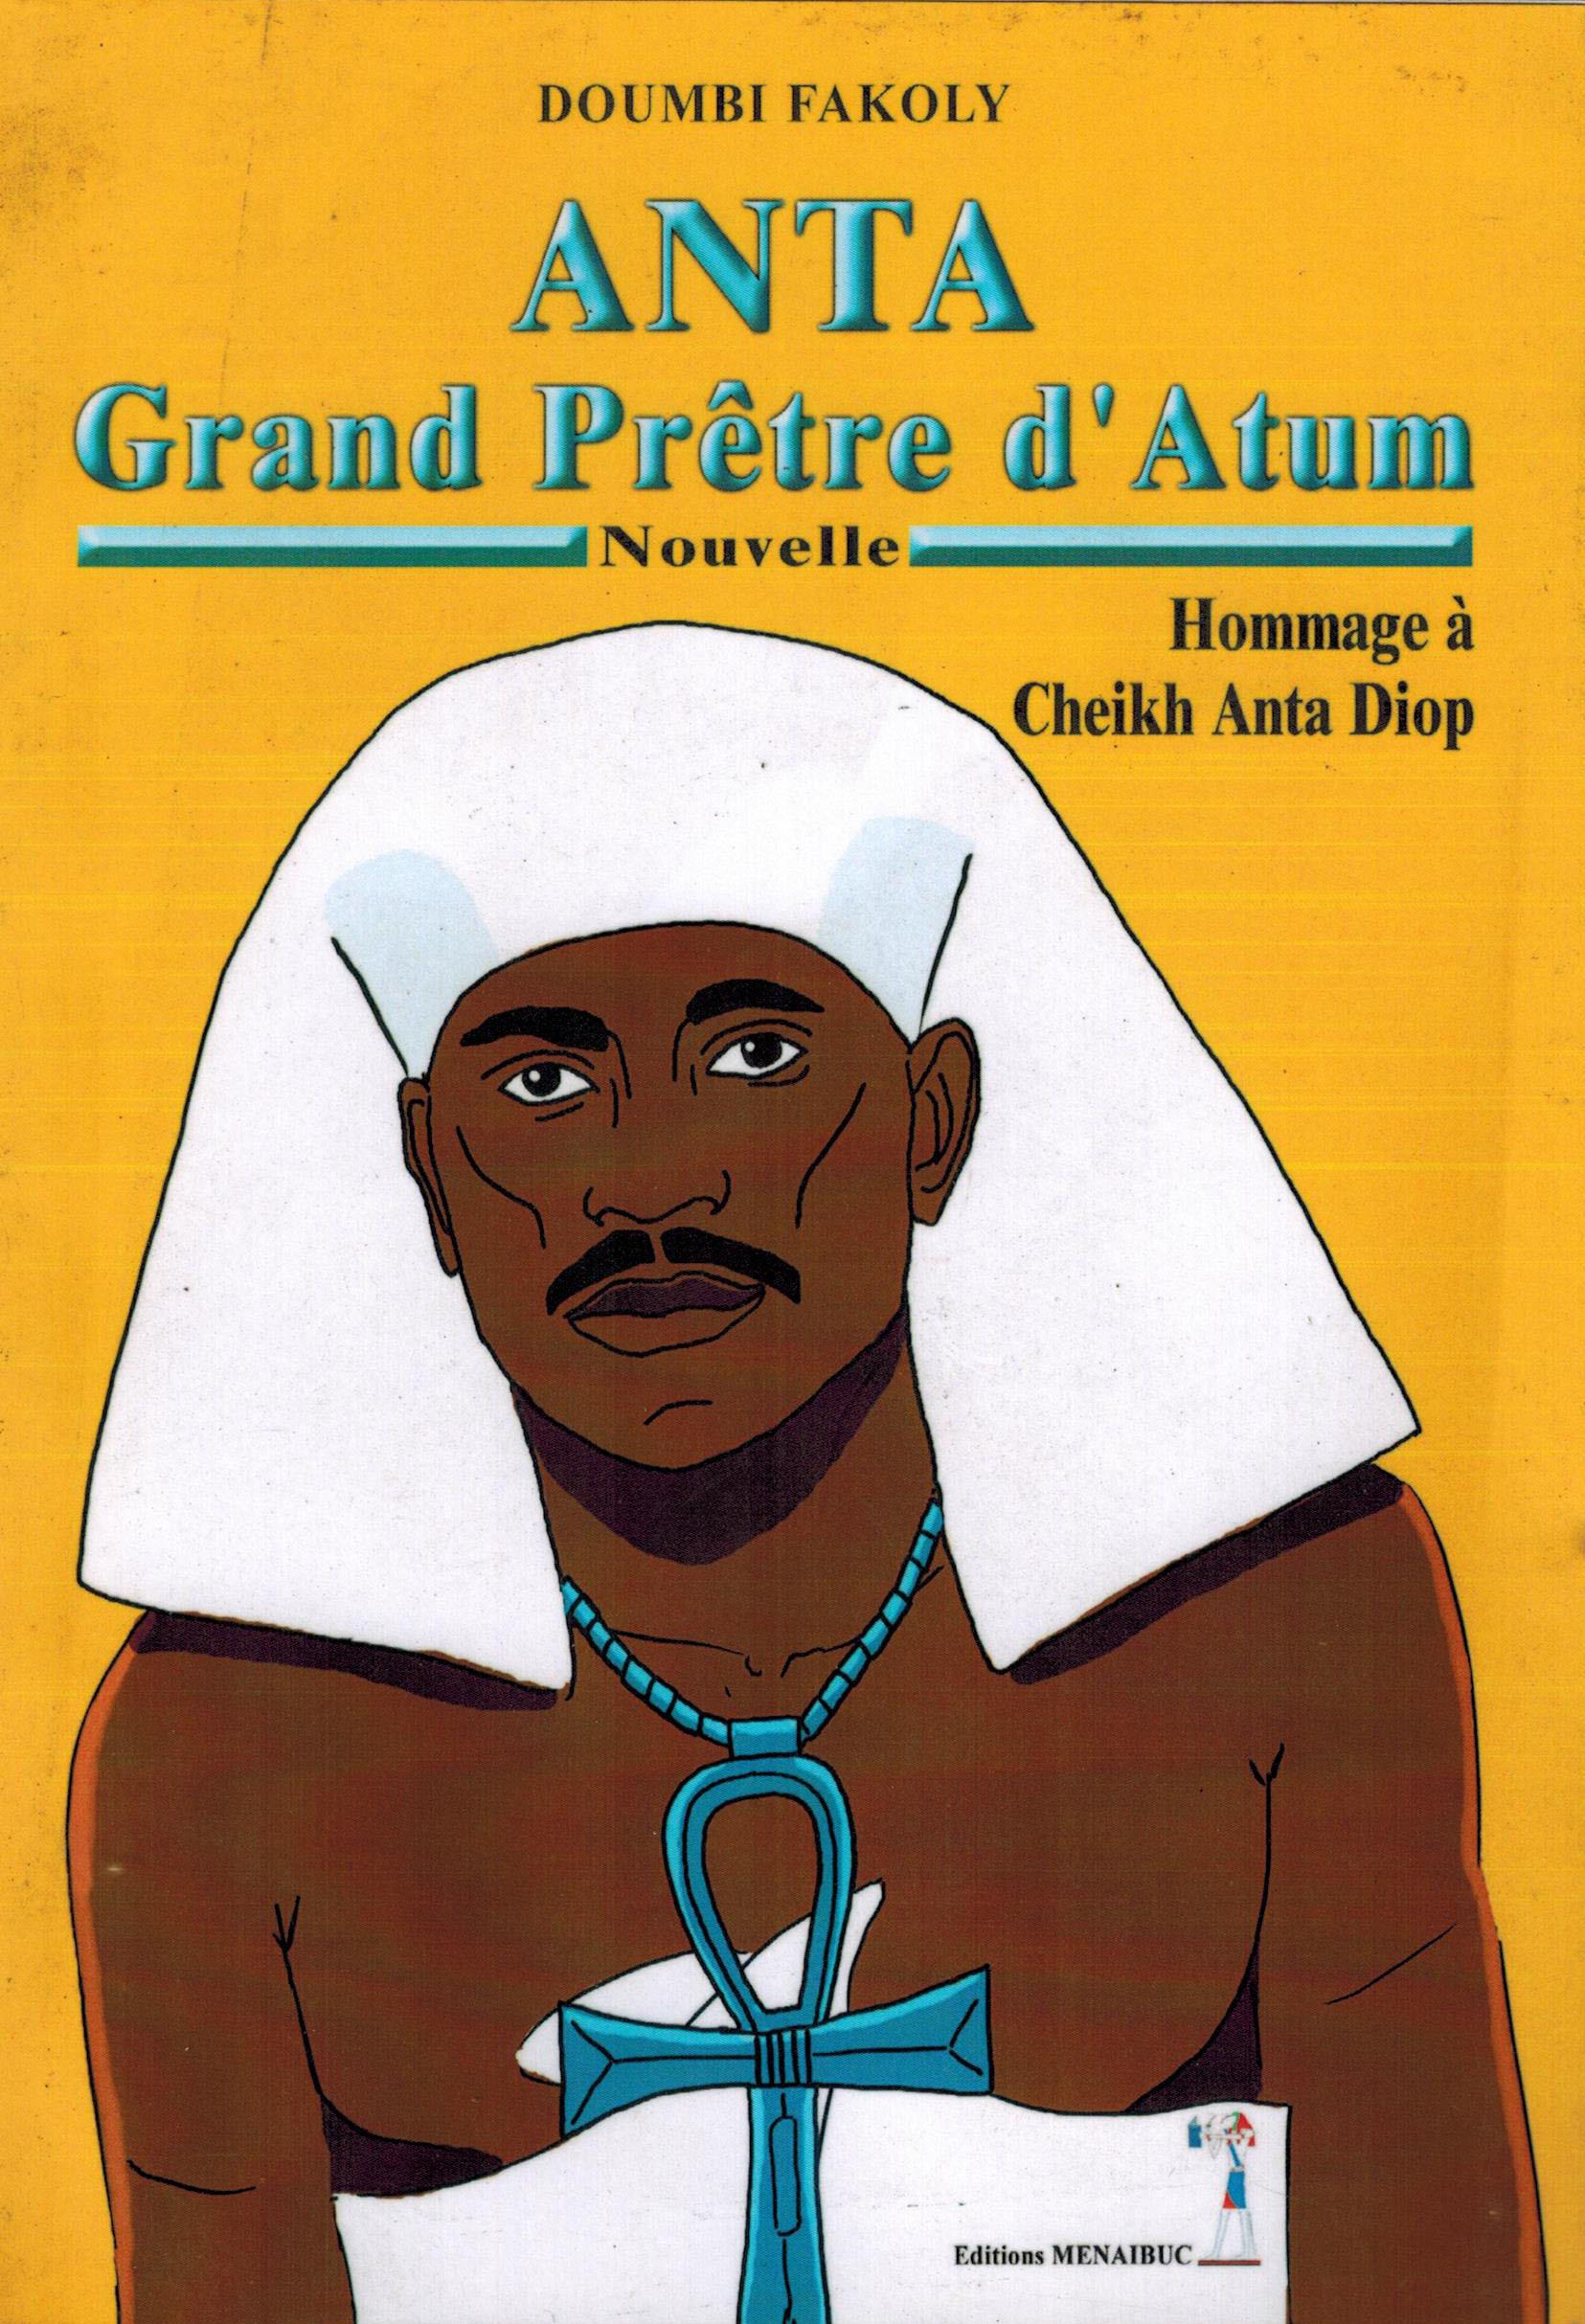 ANTA : GRAND PRETRE D'ATUM